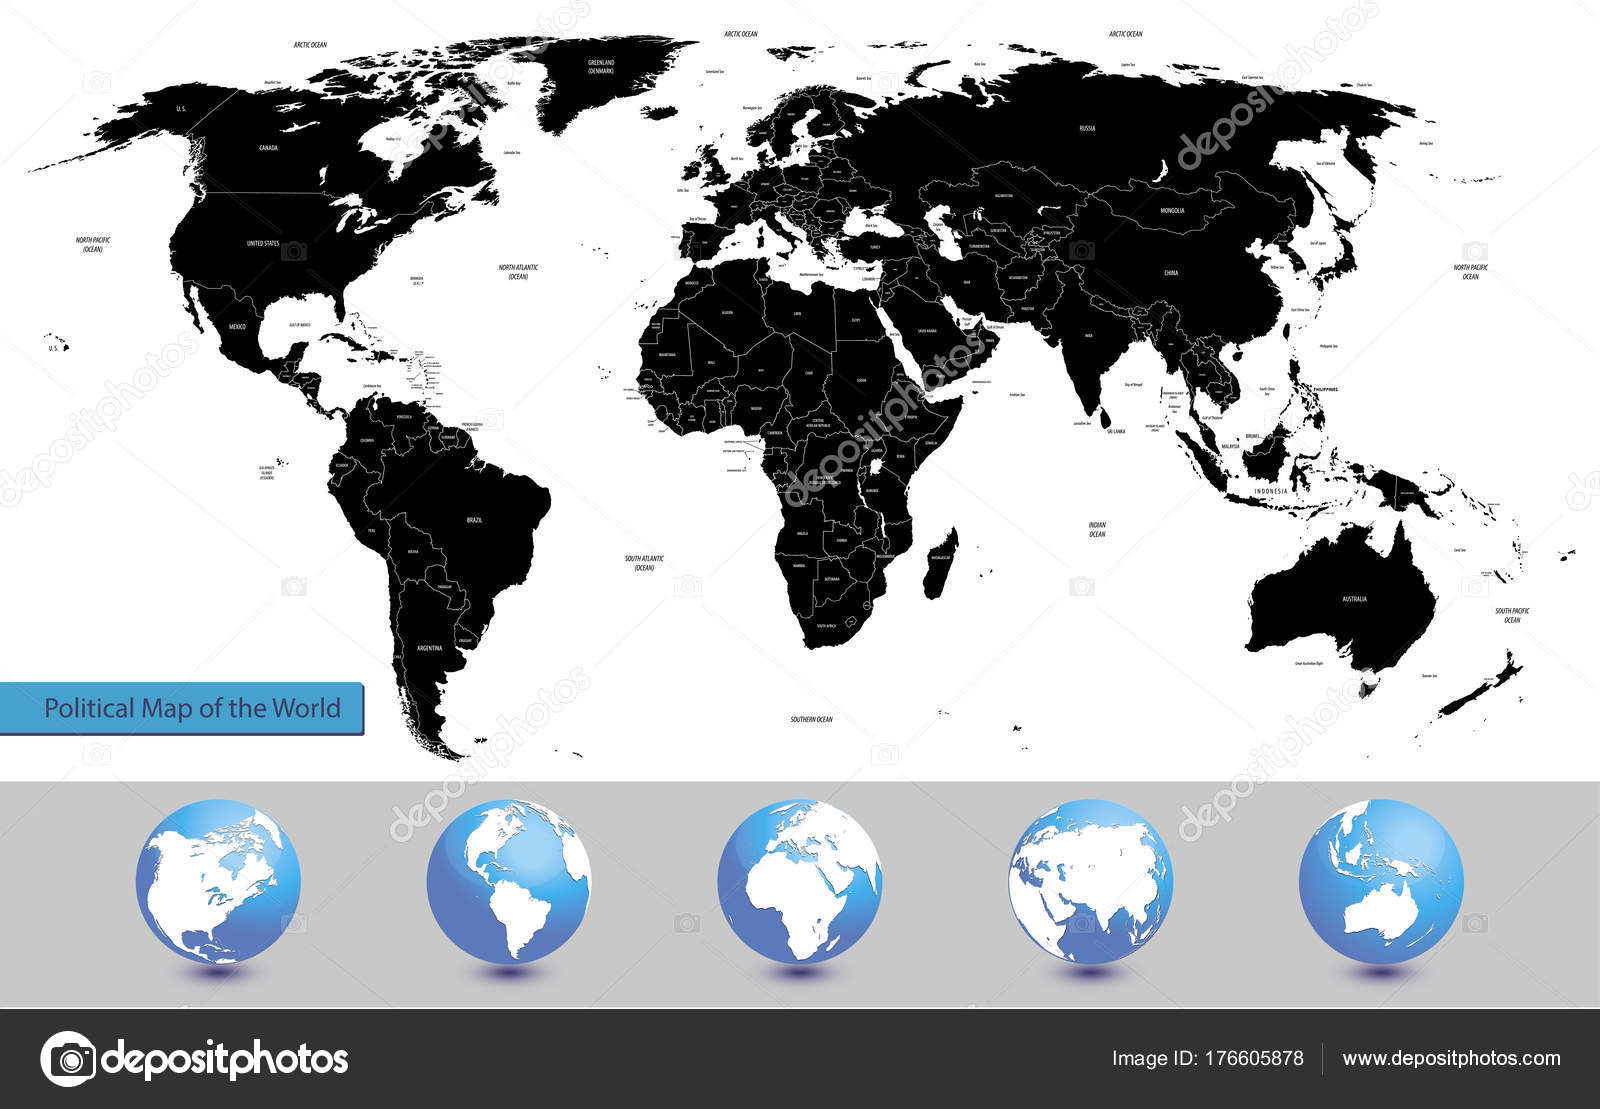 Vector illustration political map world globes stock vector vector illustration political map world globes stock vector gumiabroncs Choice Image